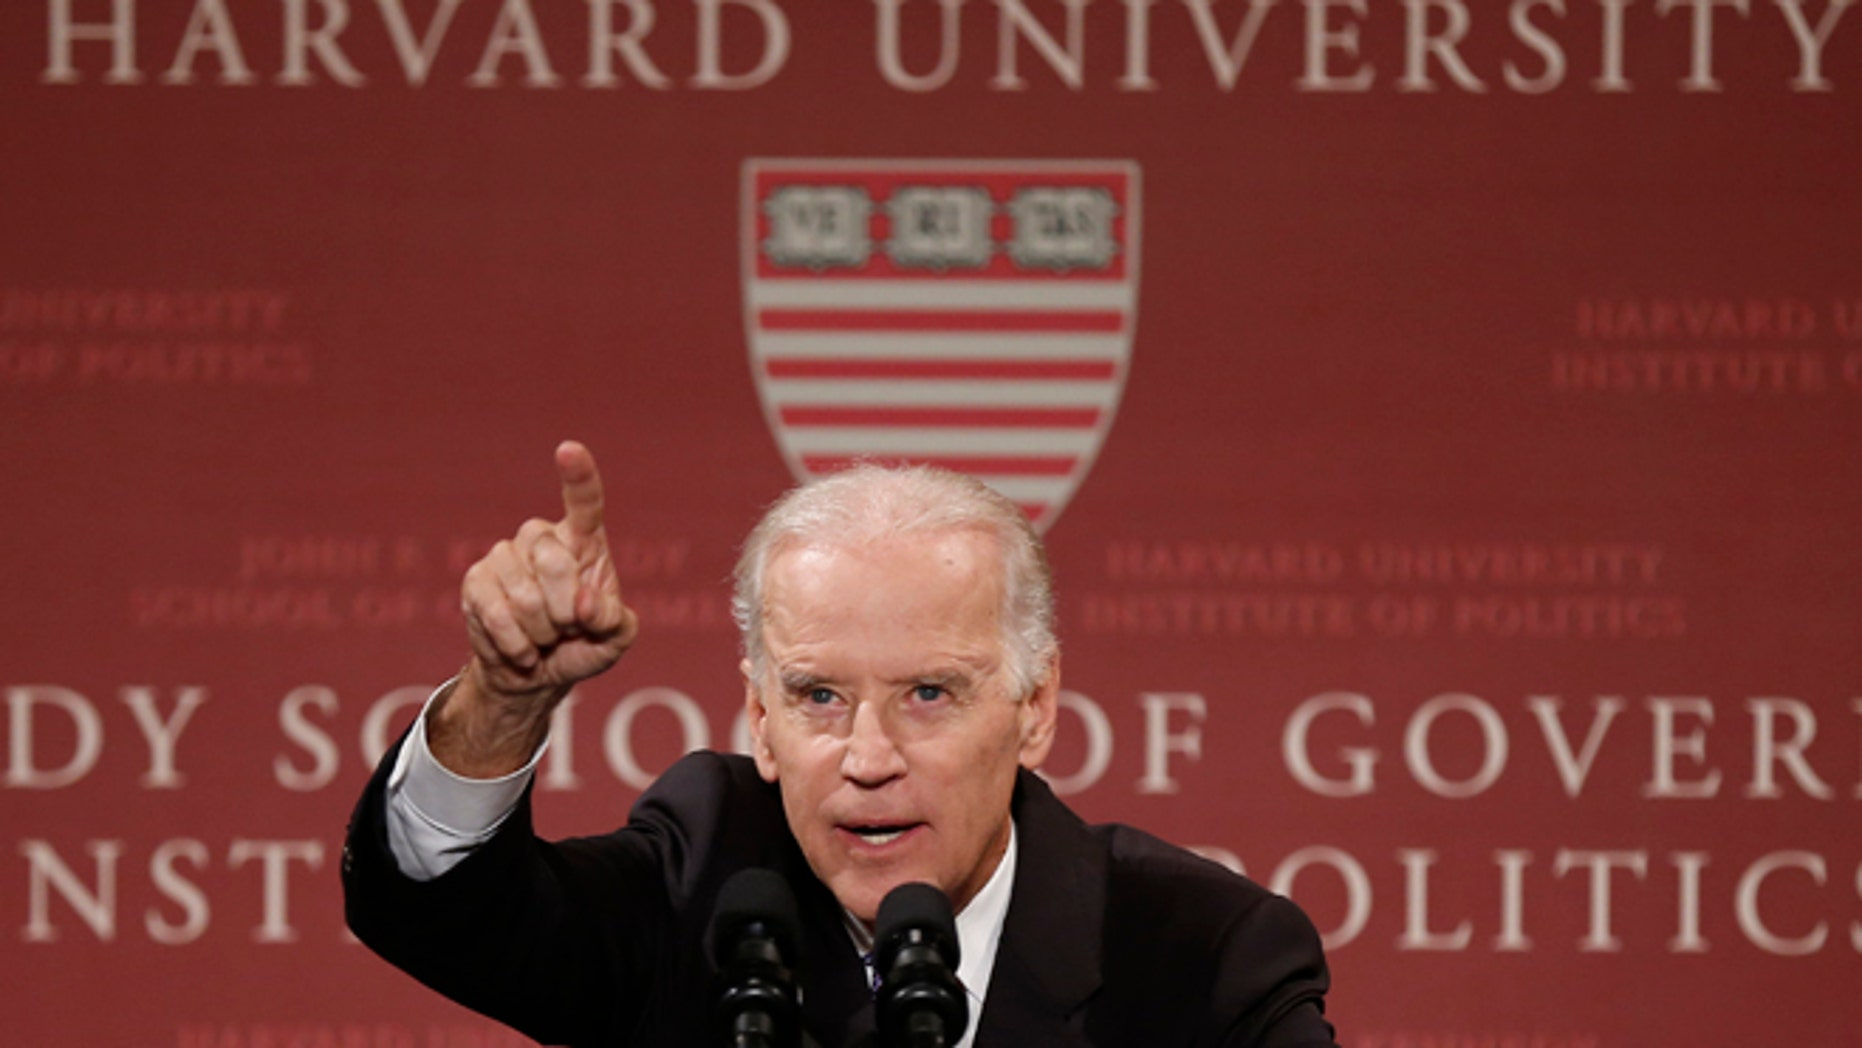 Oct. 2, 2014: Vice President Biden speaks at Harvard University'ss Kennedy School of Government in Cambridge, Mass.